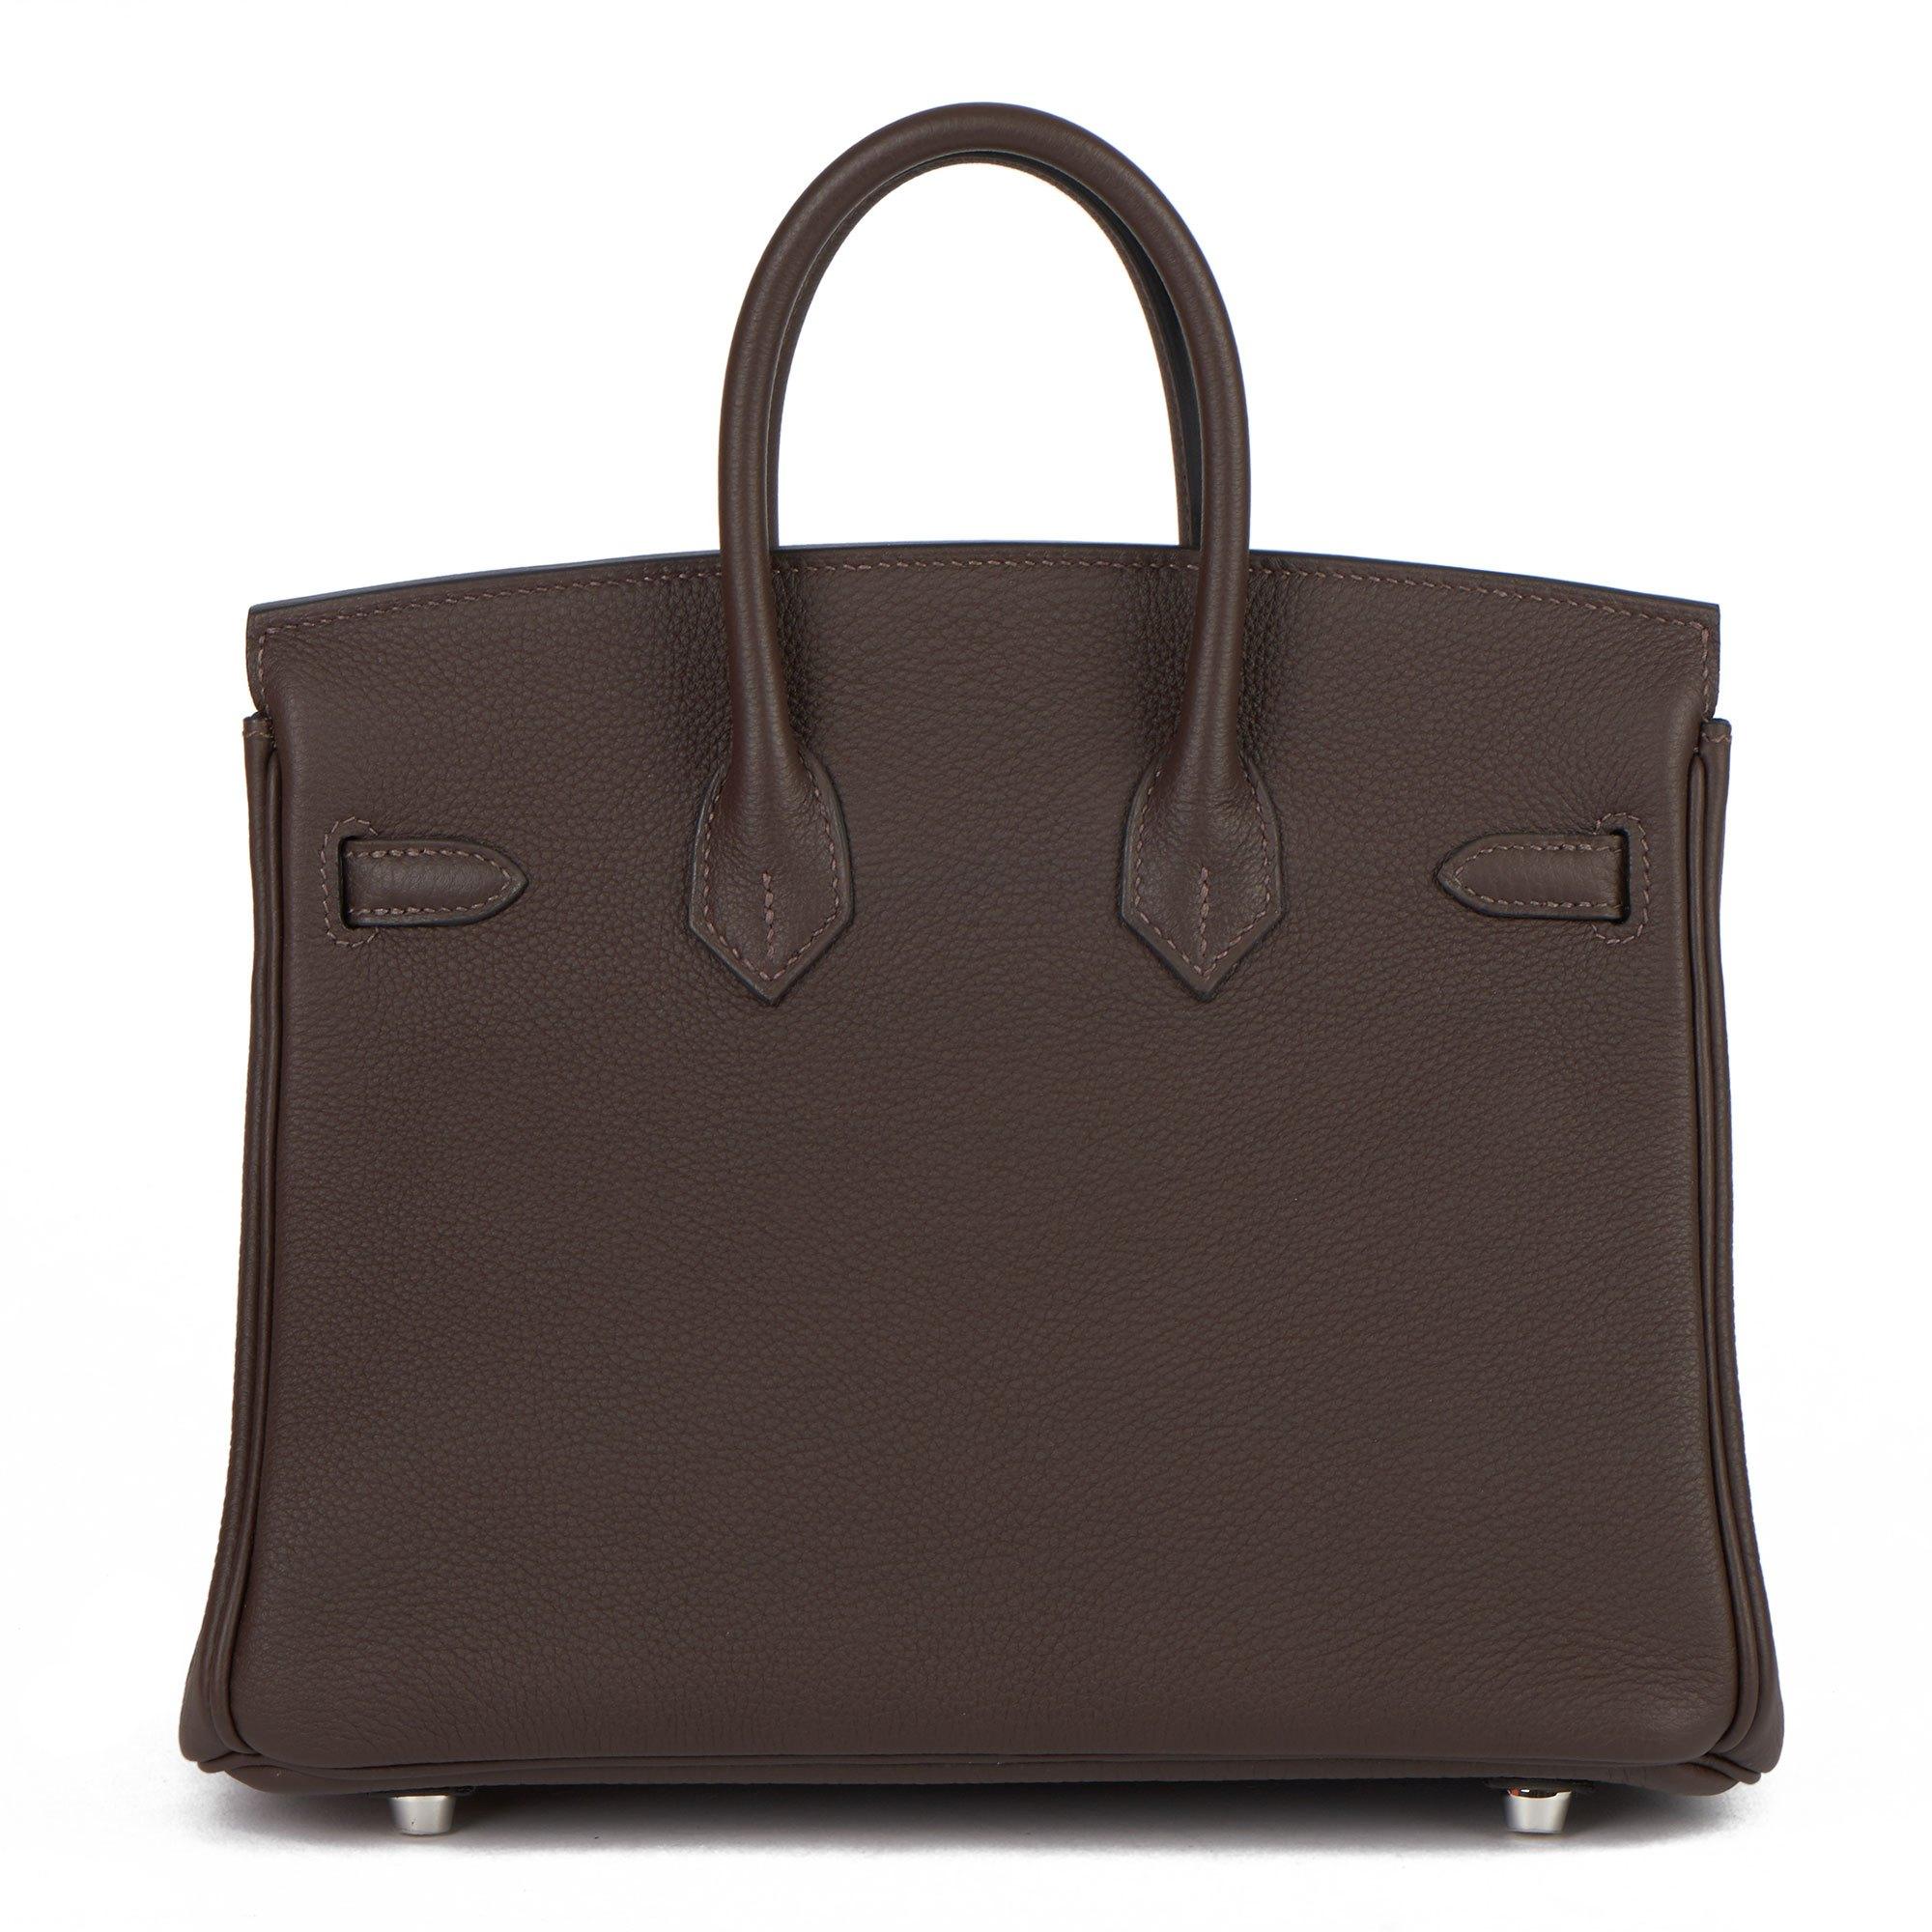 Hermès Ebene & Gold Togo Leather Verso Birkin 25cm Retourne